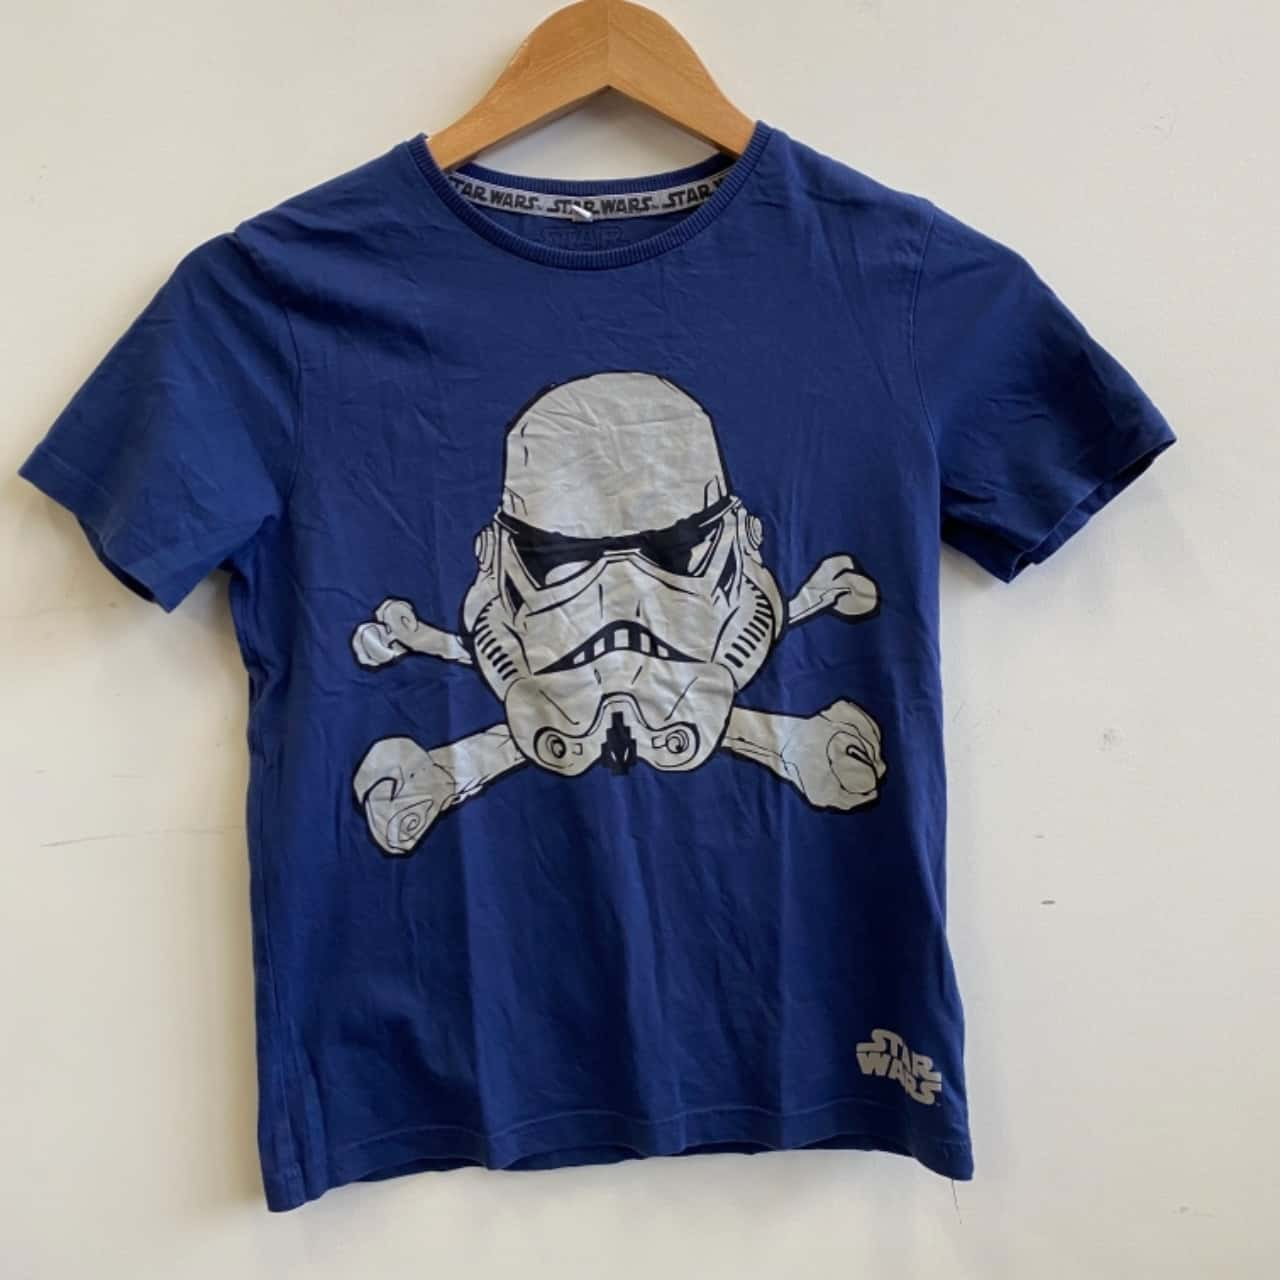 Star Wars Kids Size 9-10 Years Stormtrooper Print Navy T-shirt